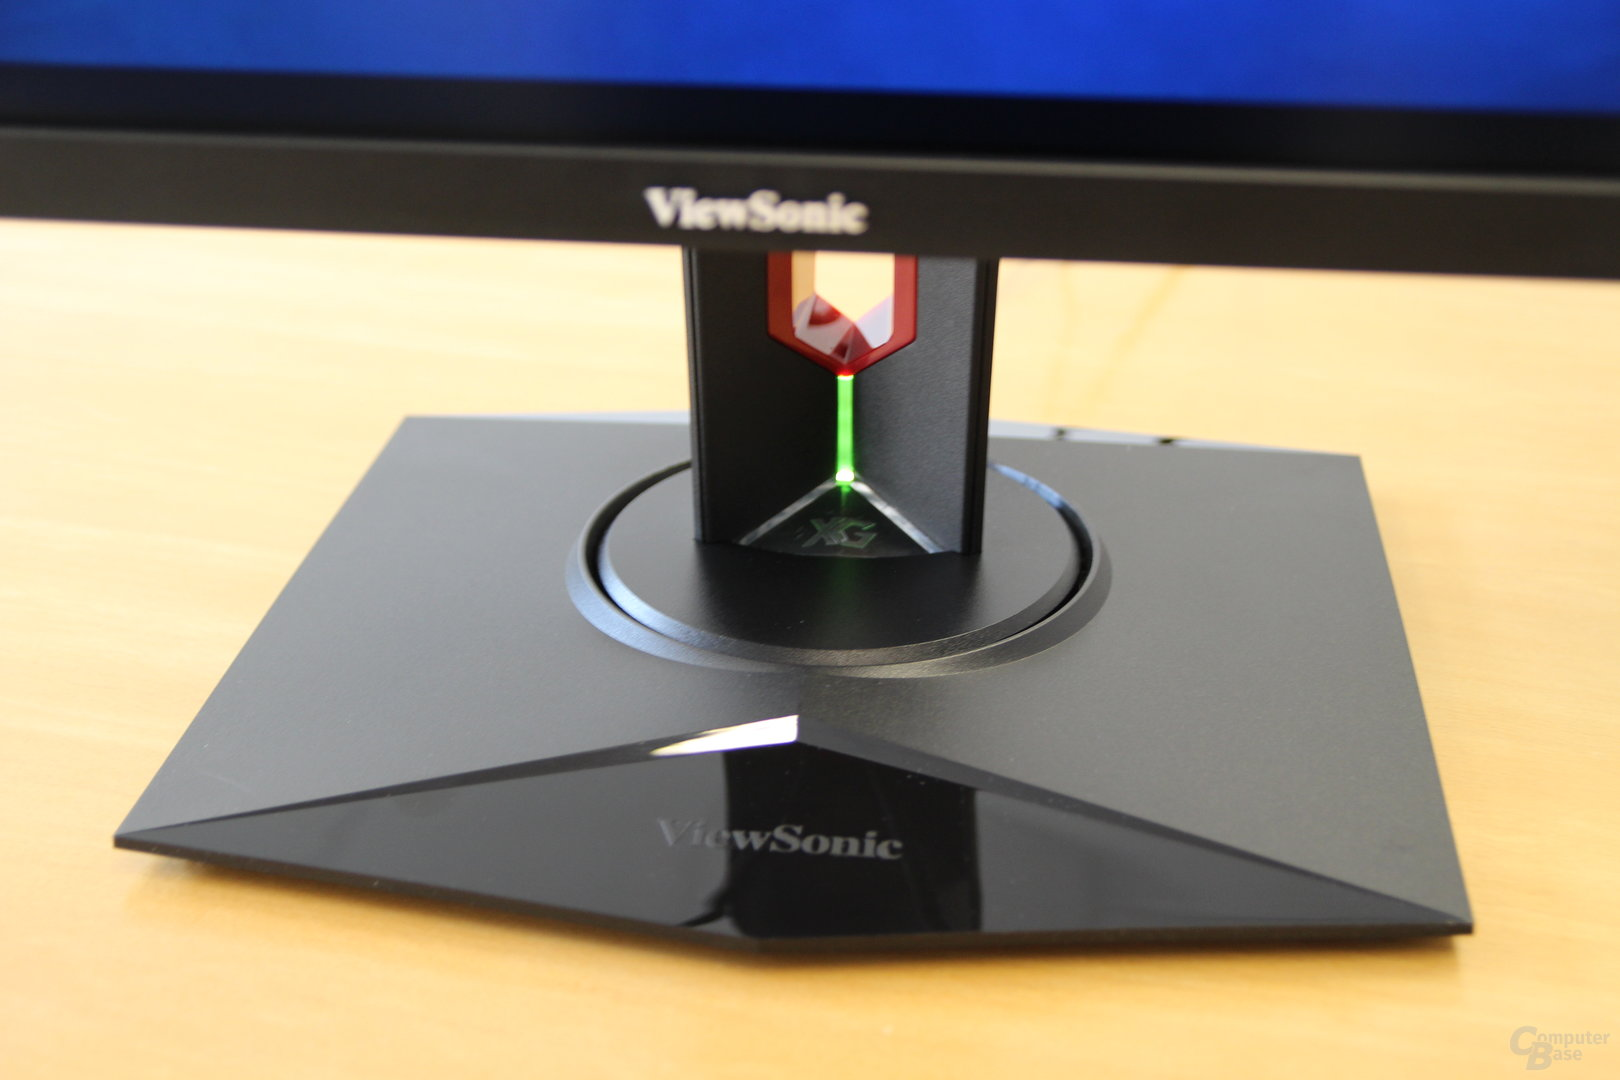 ViewSonic XG3220 – Dezente RGB-Beleuchtung im Standfuß